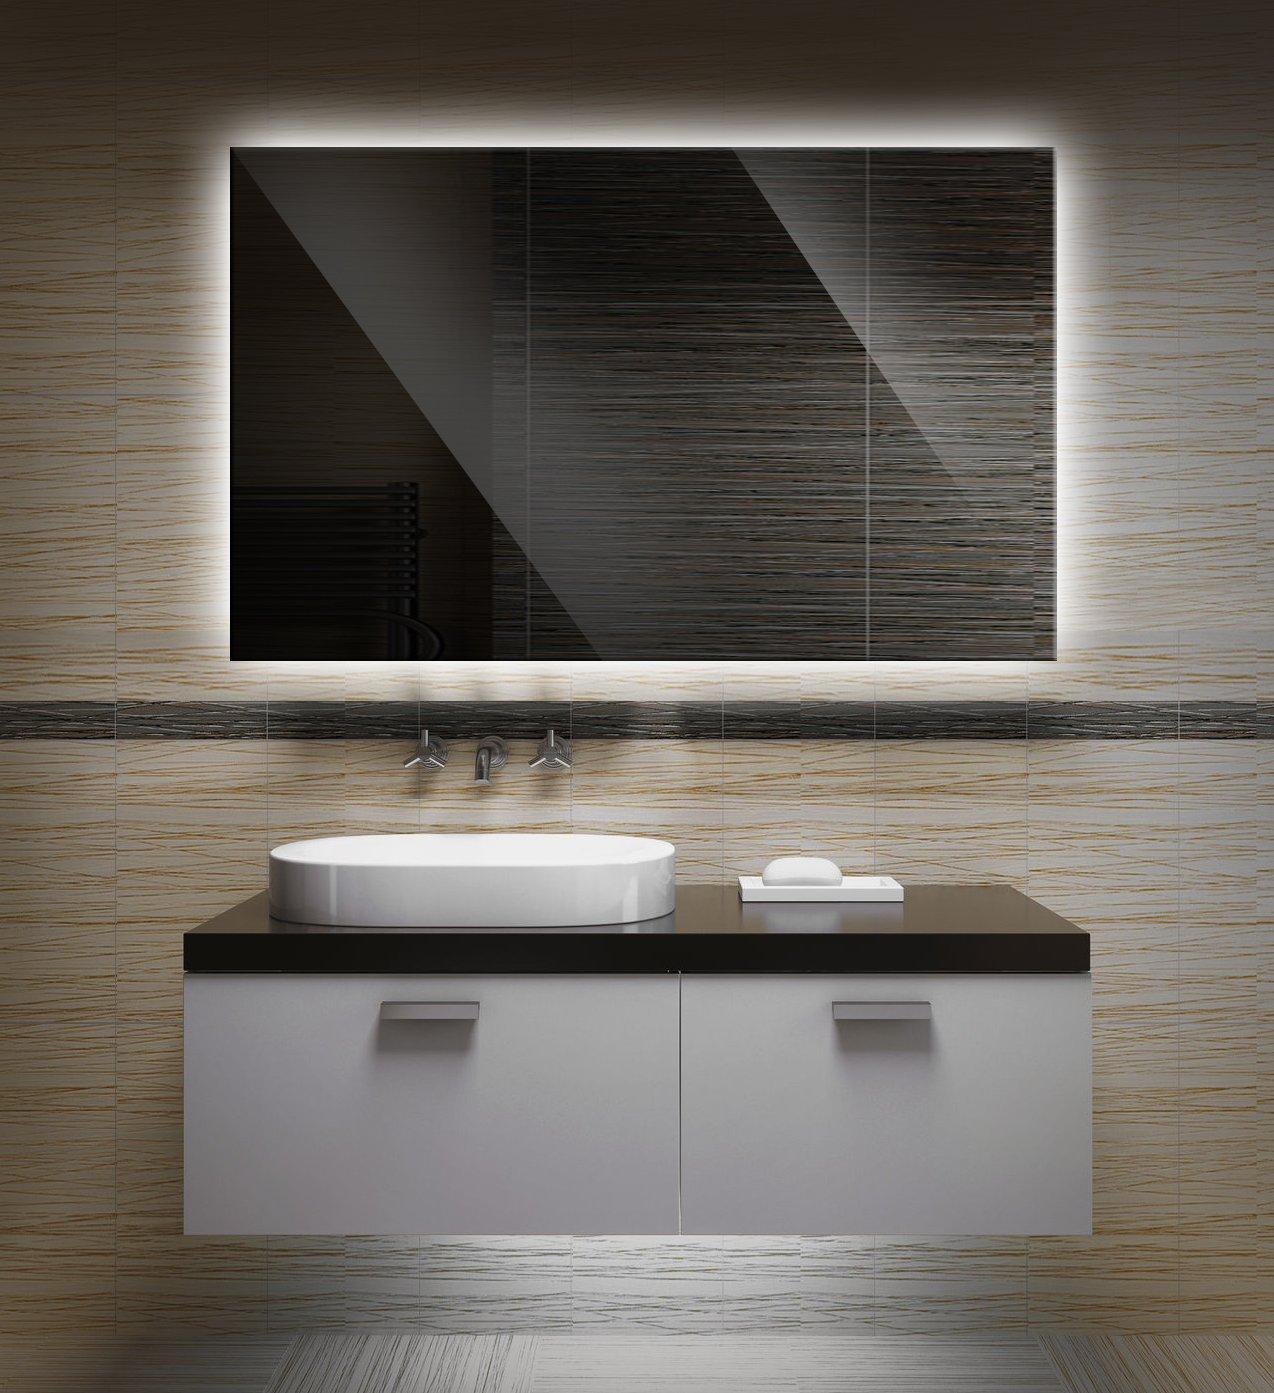 Bilderdepot24 Beleuchteter LED Spiegel Badspiegel Wandspiegel mit Beleuchtung - 80x60 cm OZ-LED